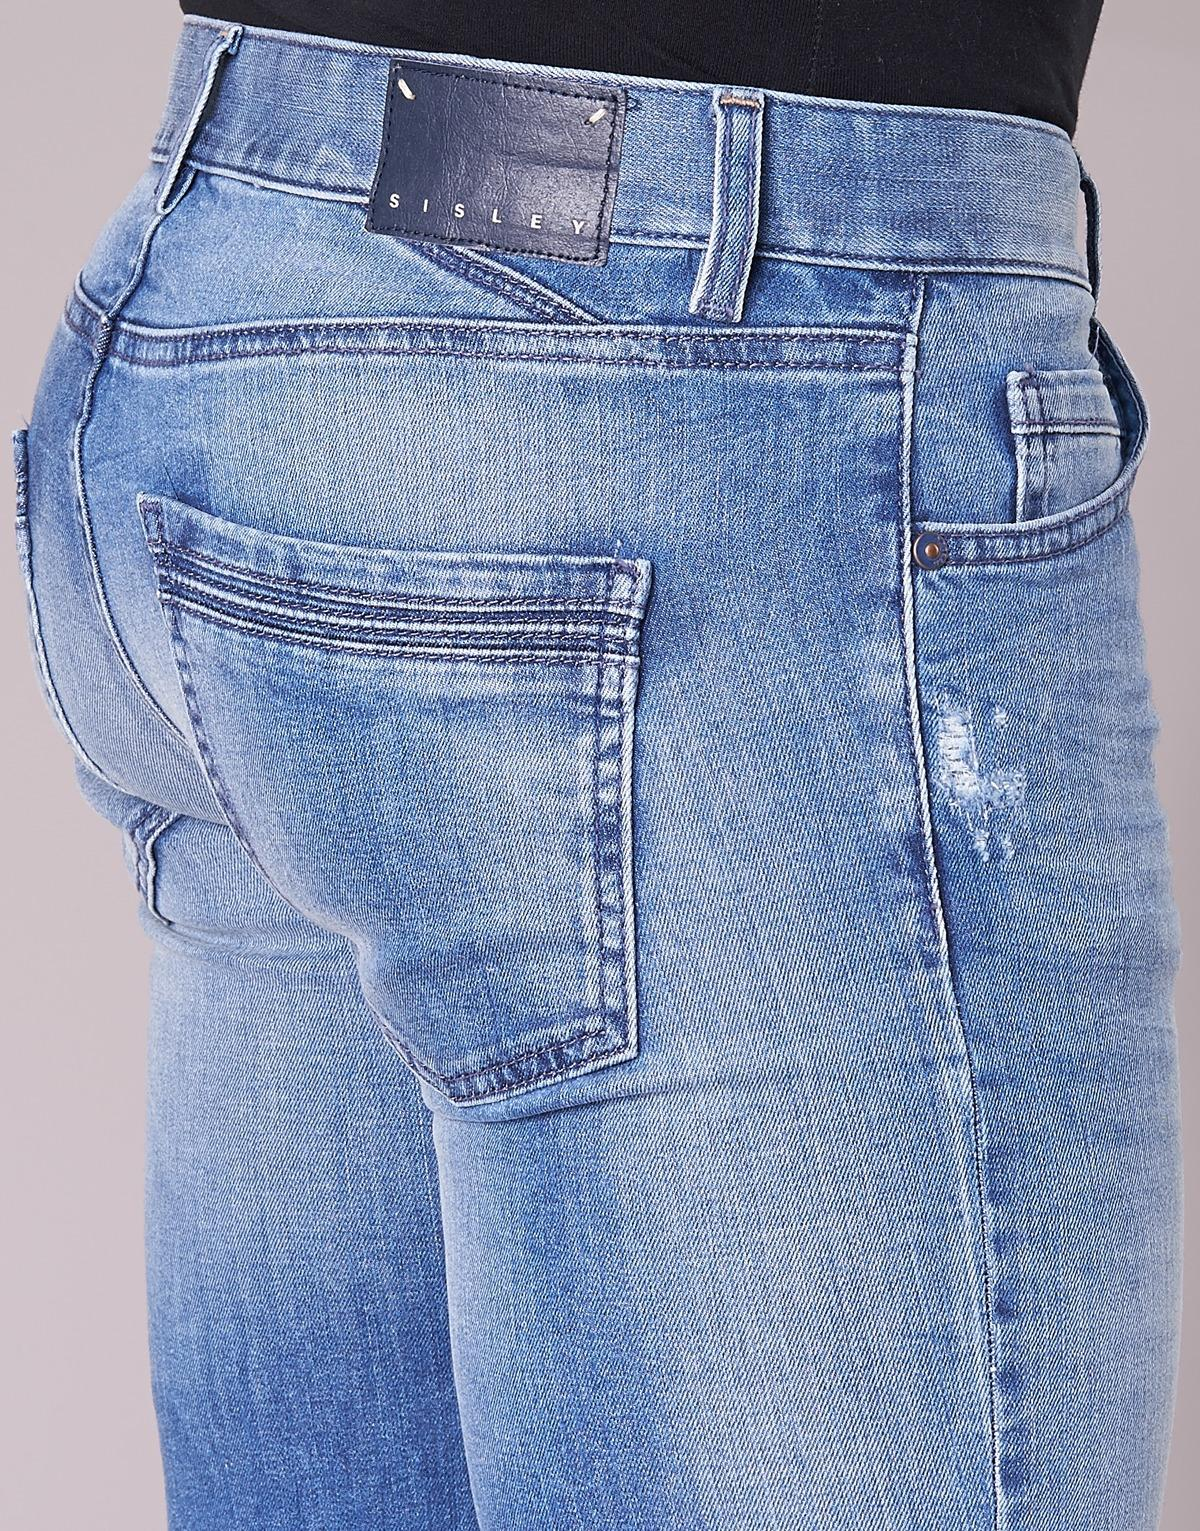 Sisley Denim Skinny Jeans Burludu in het Blauw voor heren